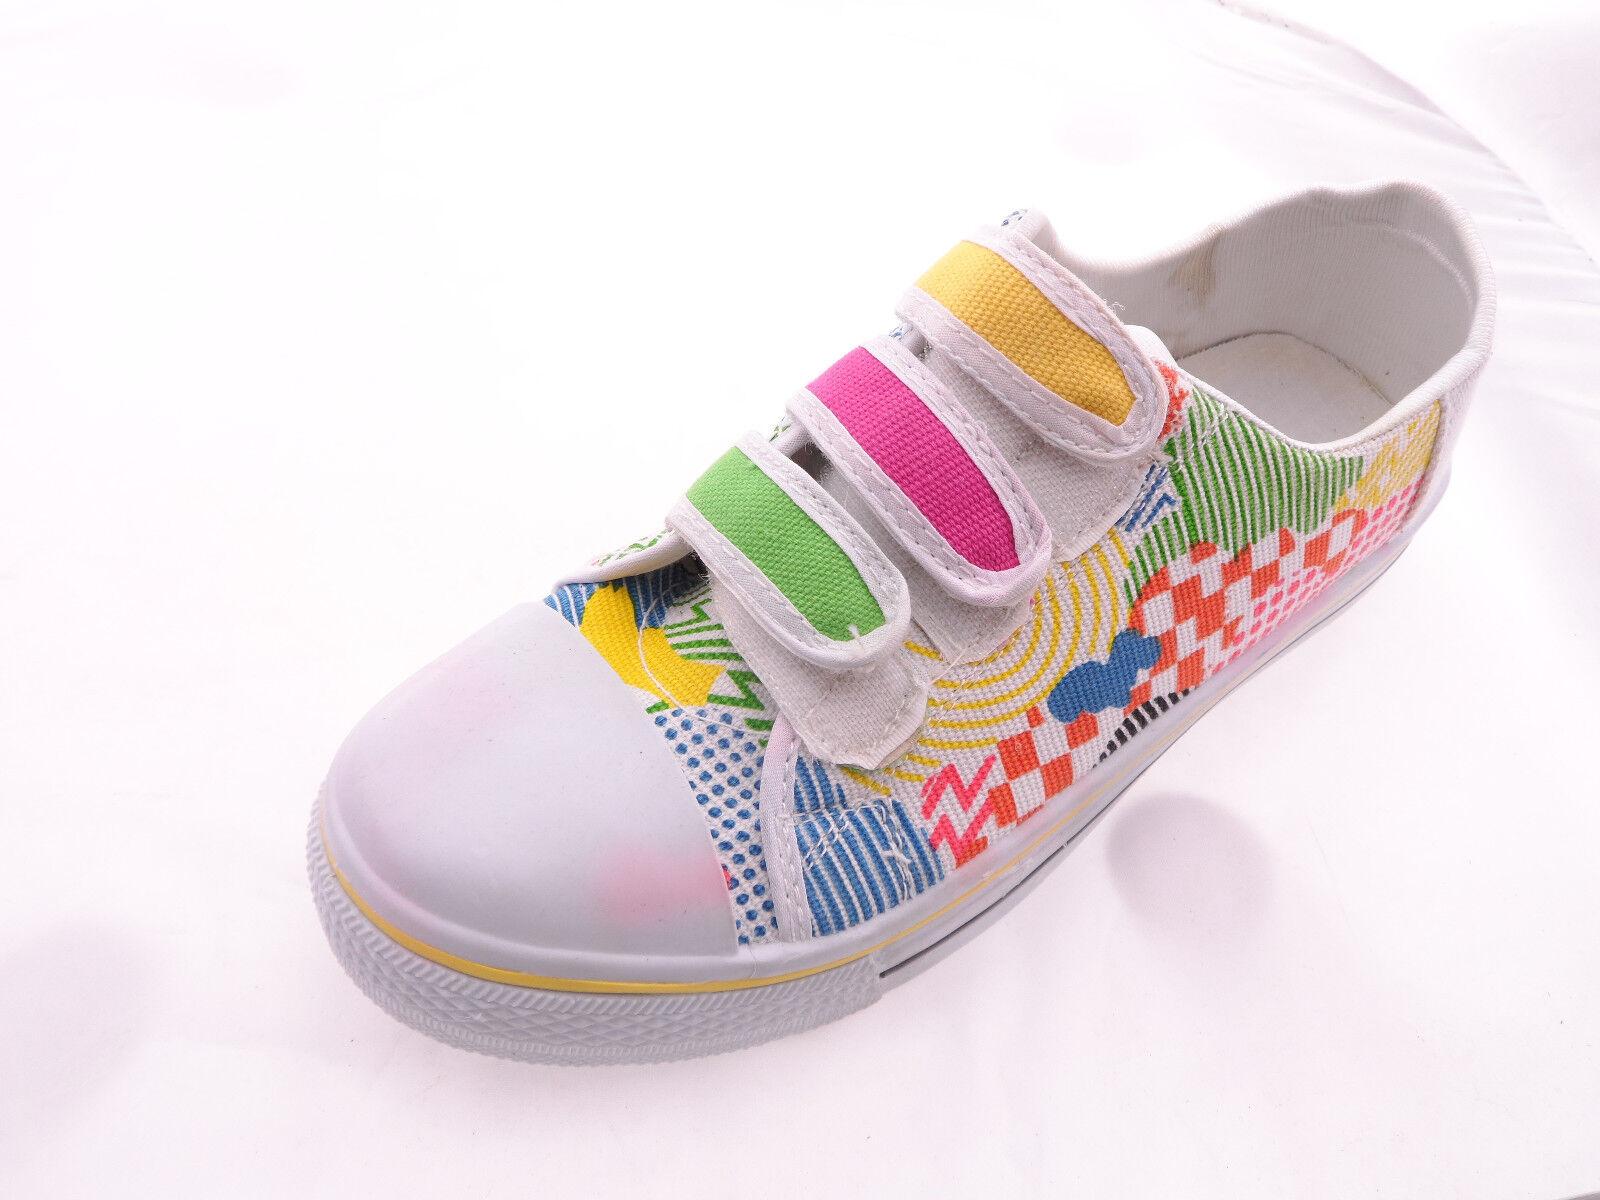 Bumper Women Multy color Sneakers three Vecro strap Size 8.5M